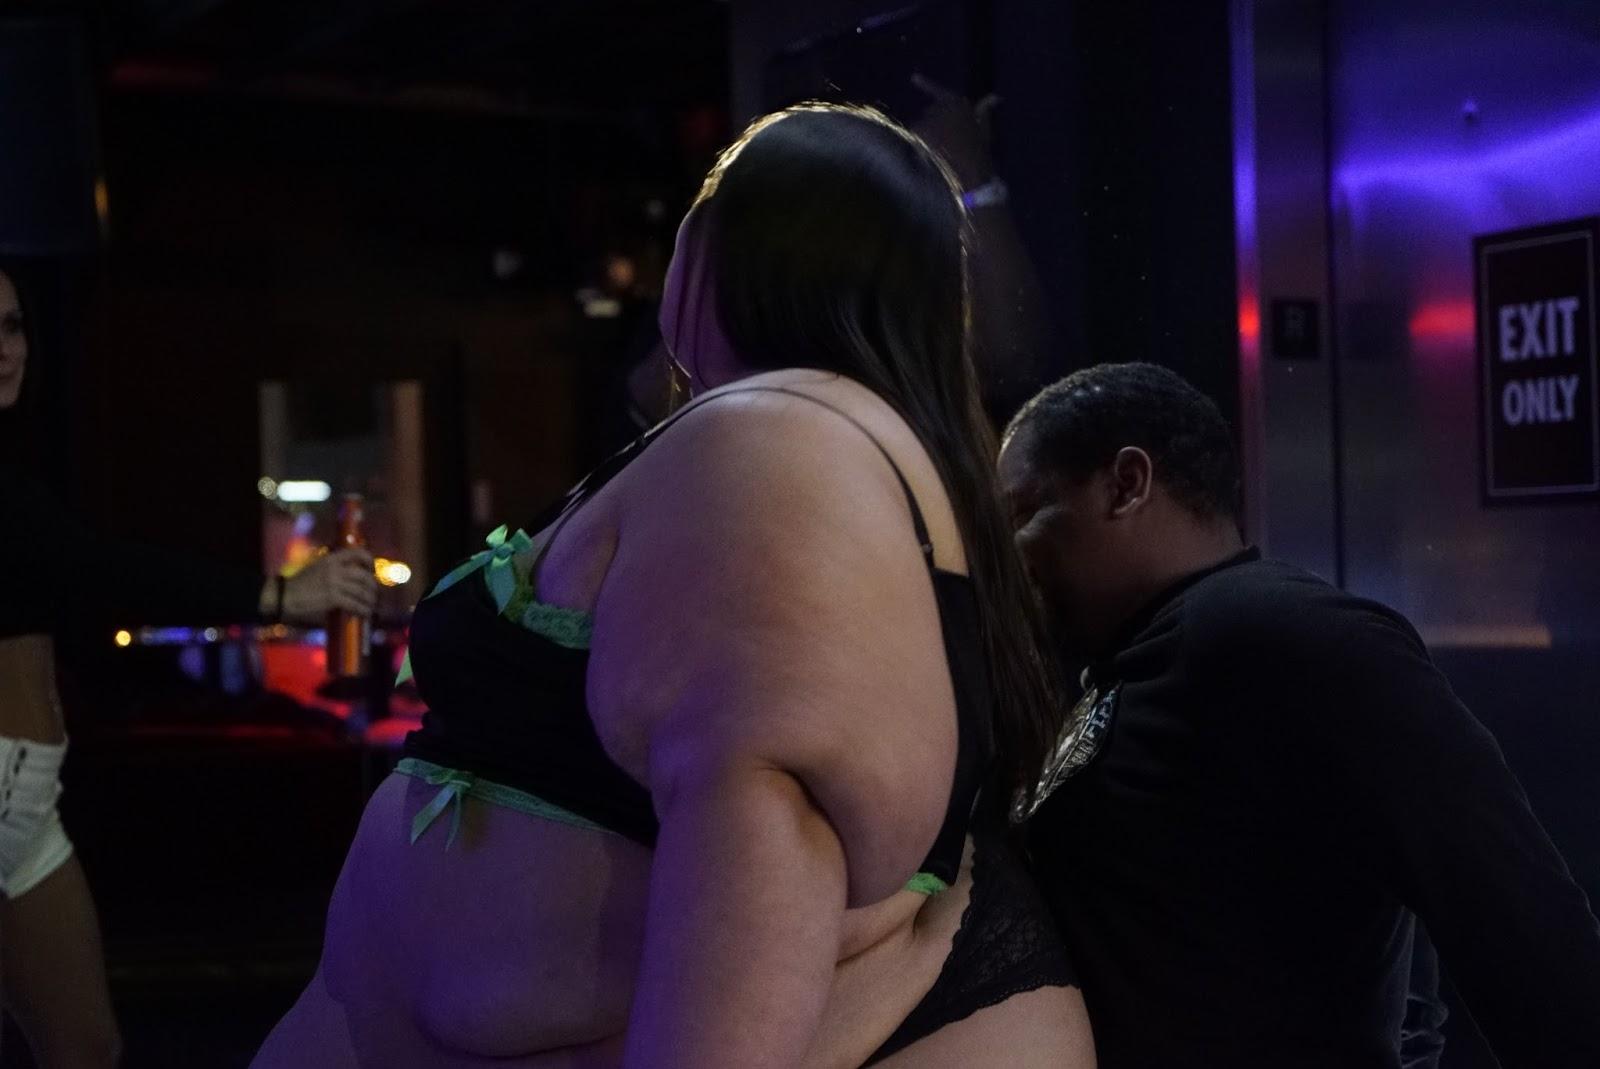 New femdom video